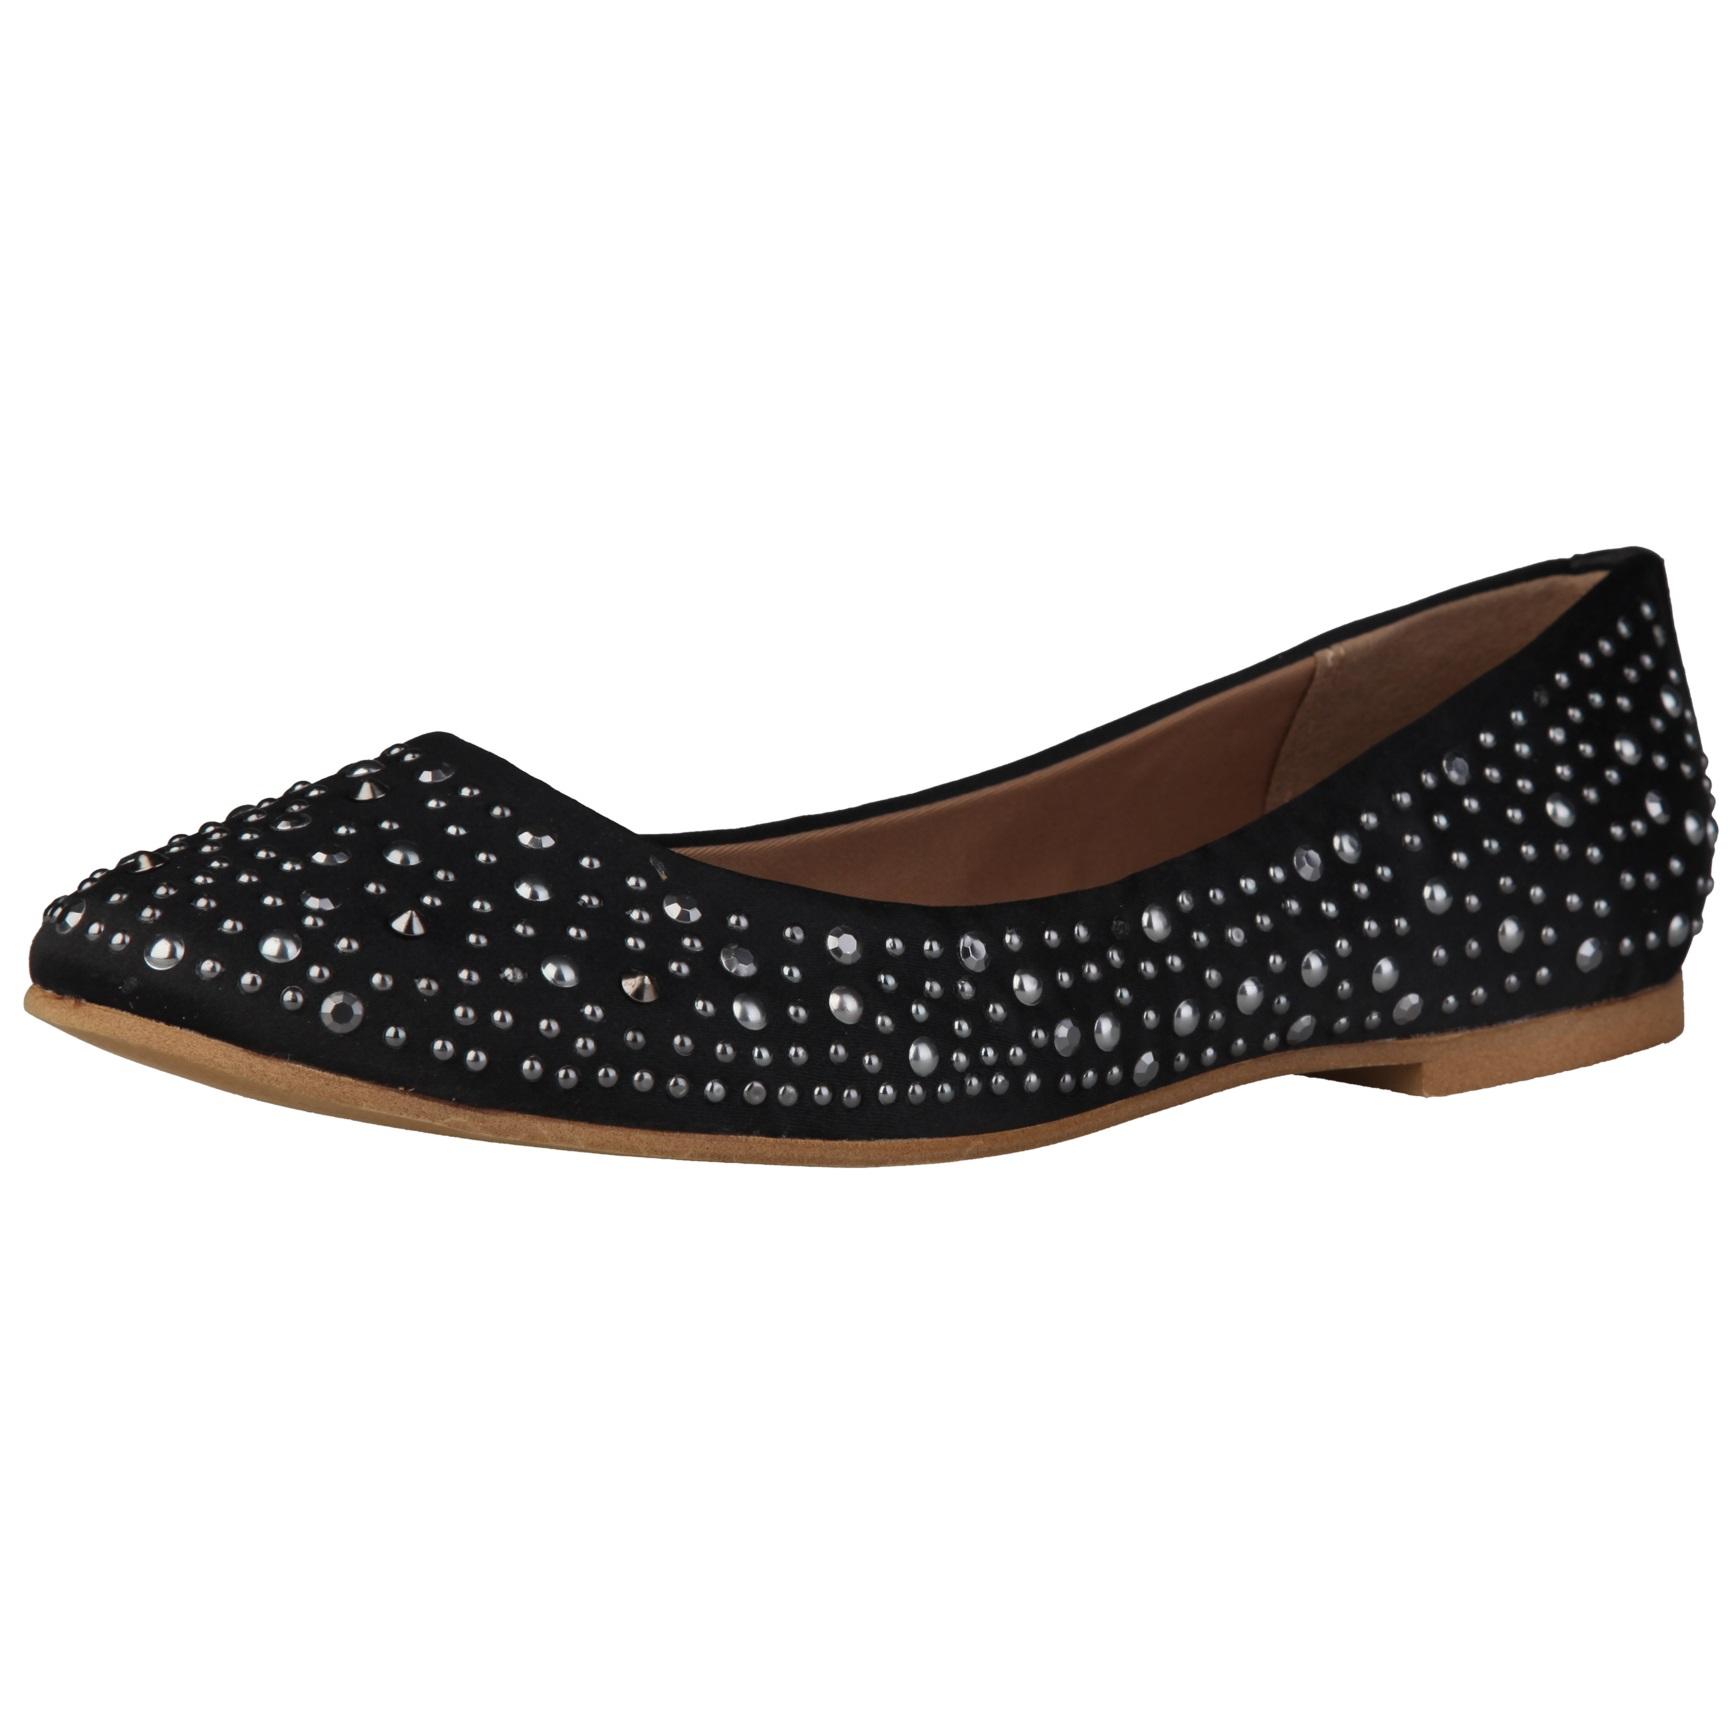 Sofia Loes Flat Shoes Black Rf600153